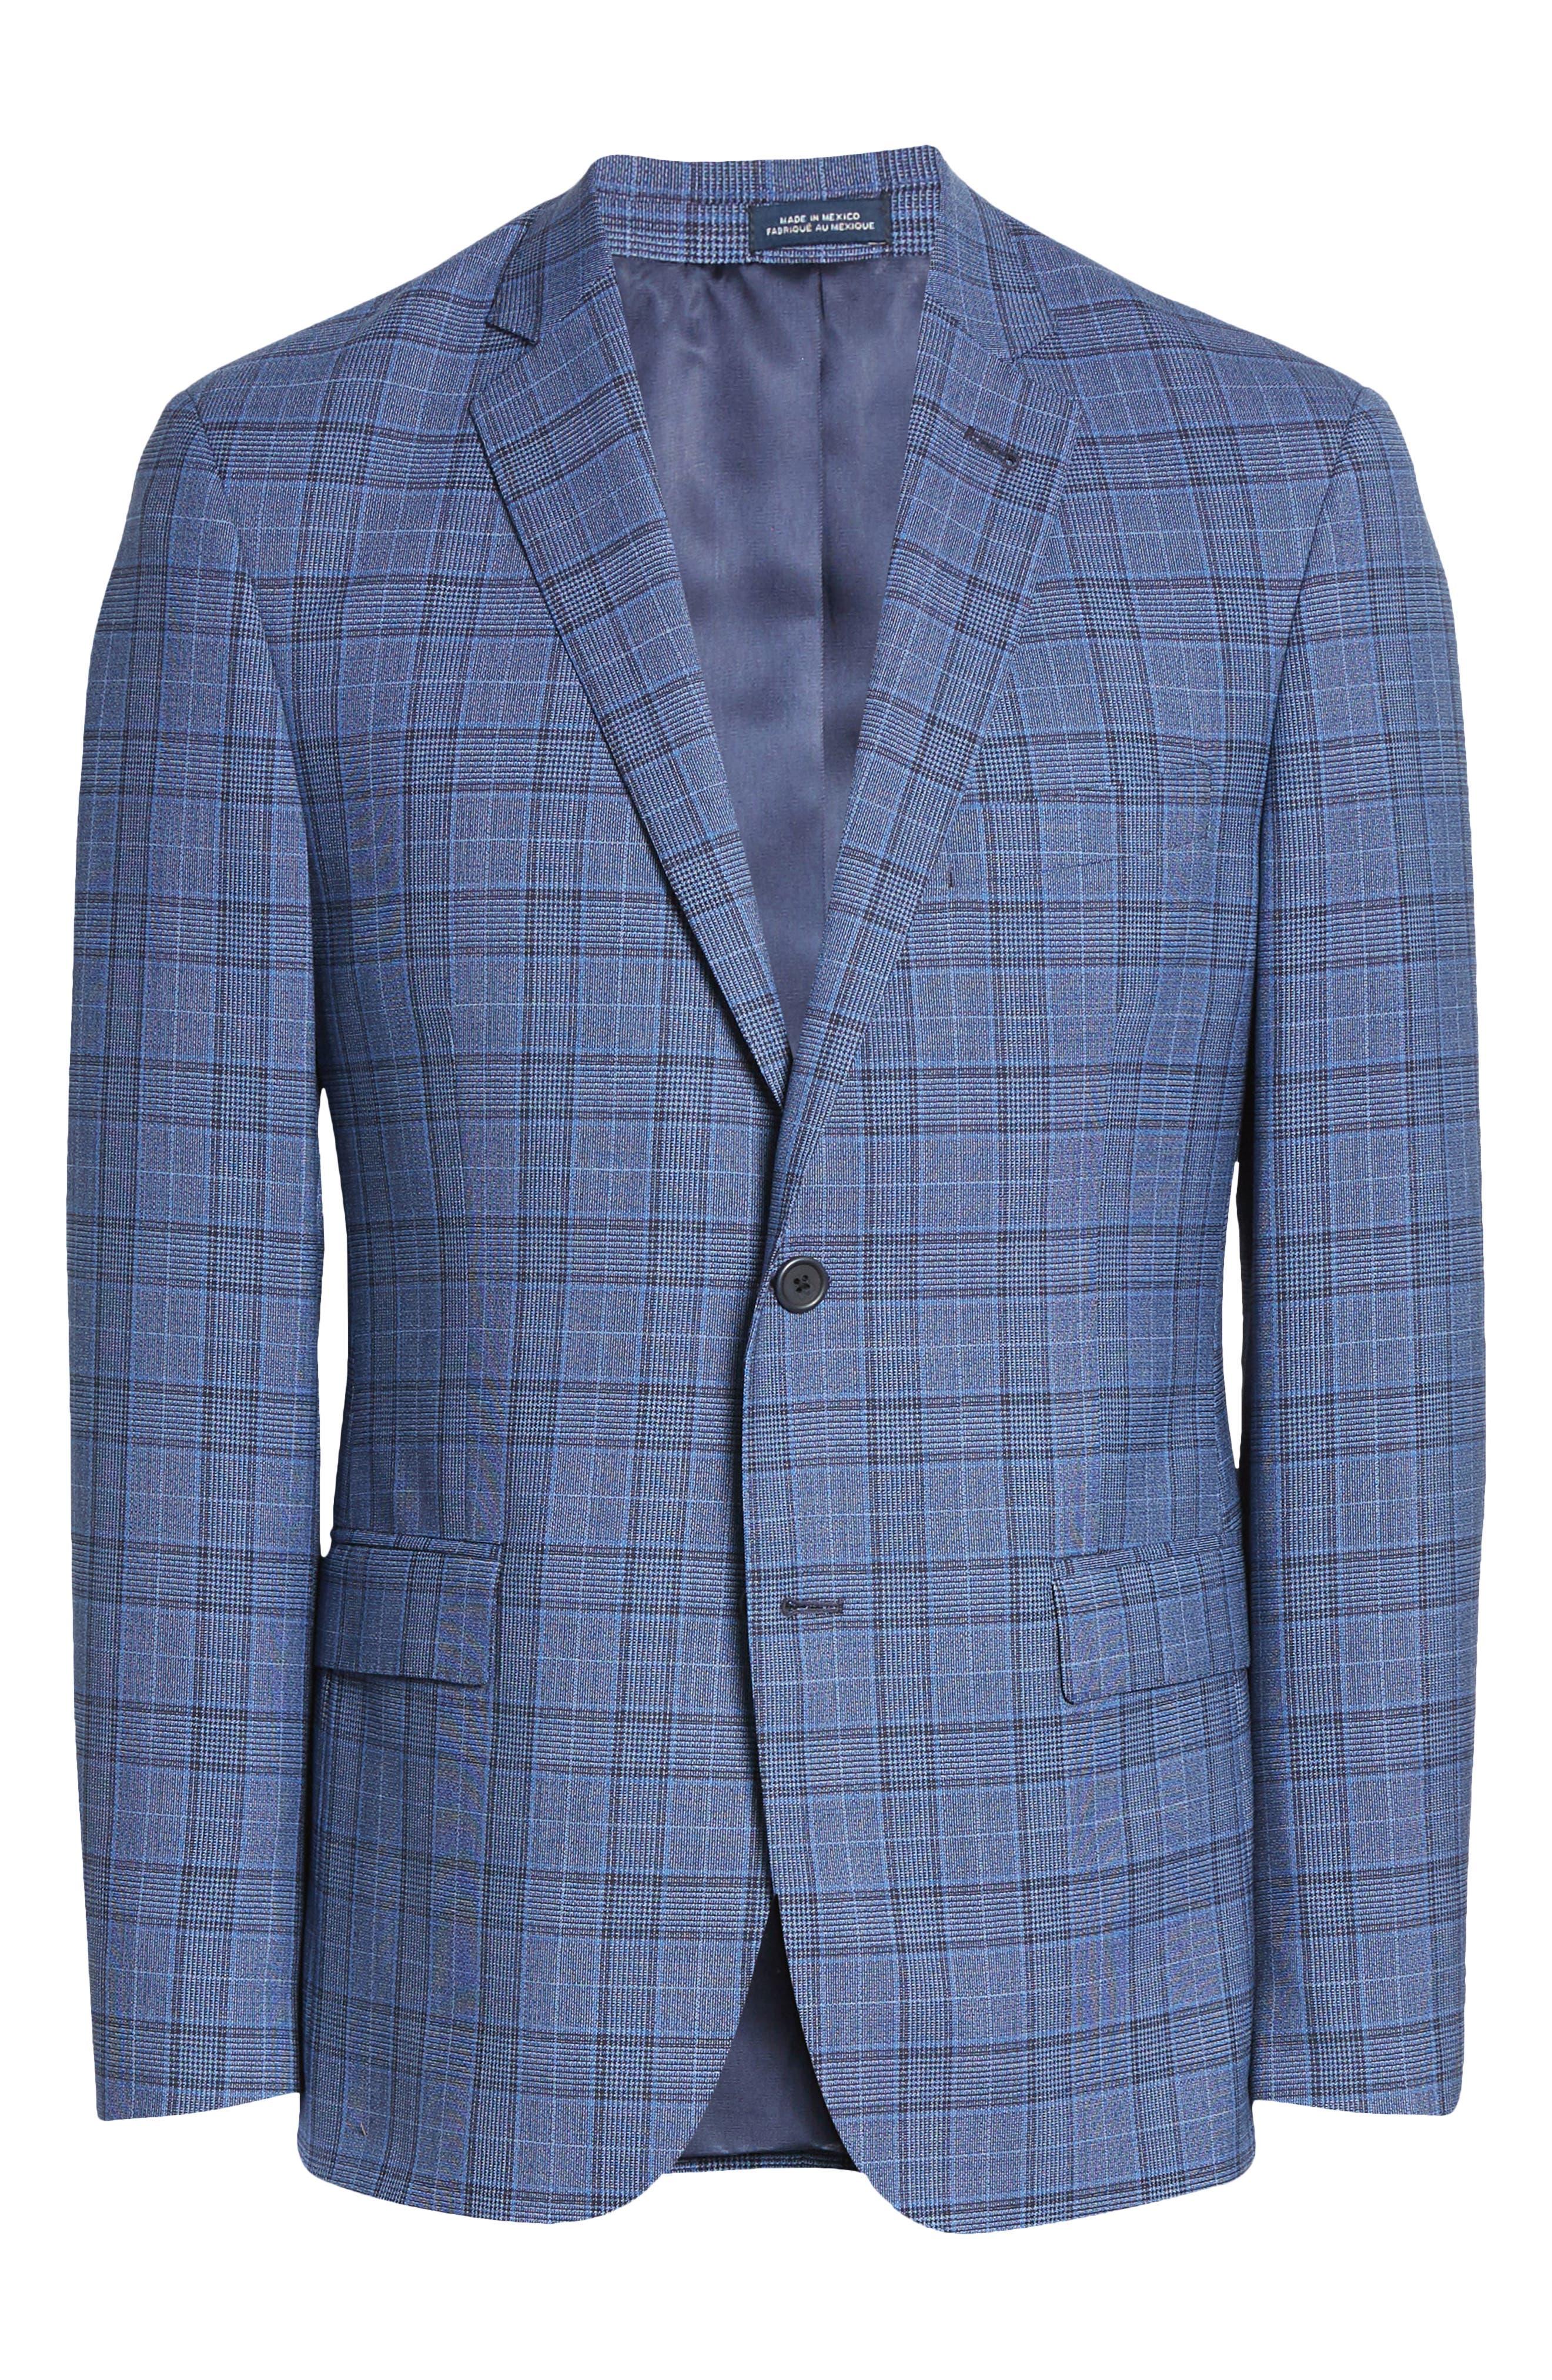 Image of John W. Nordstrom Traditional Fit Glen Plaid Wool Sport Coat